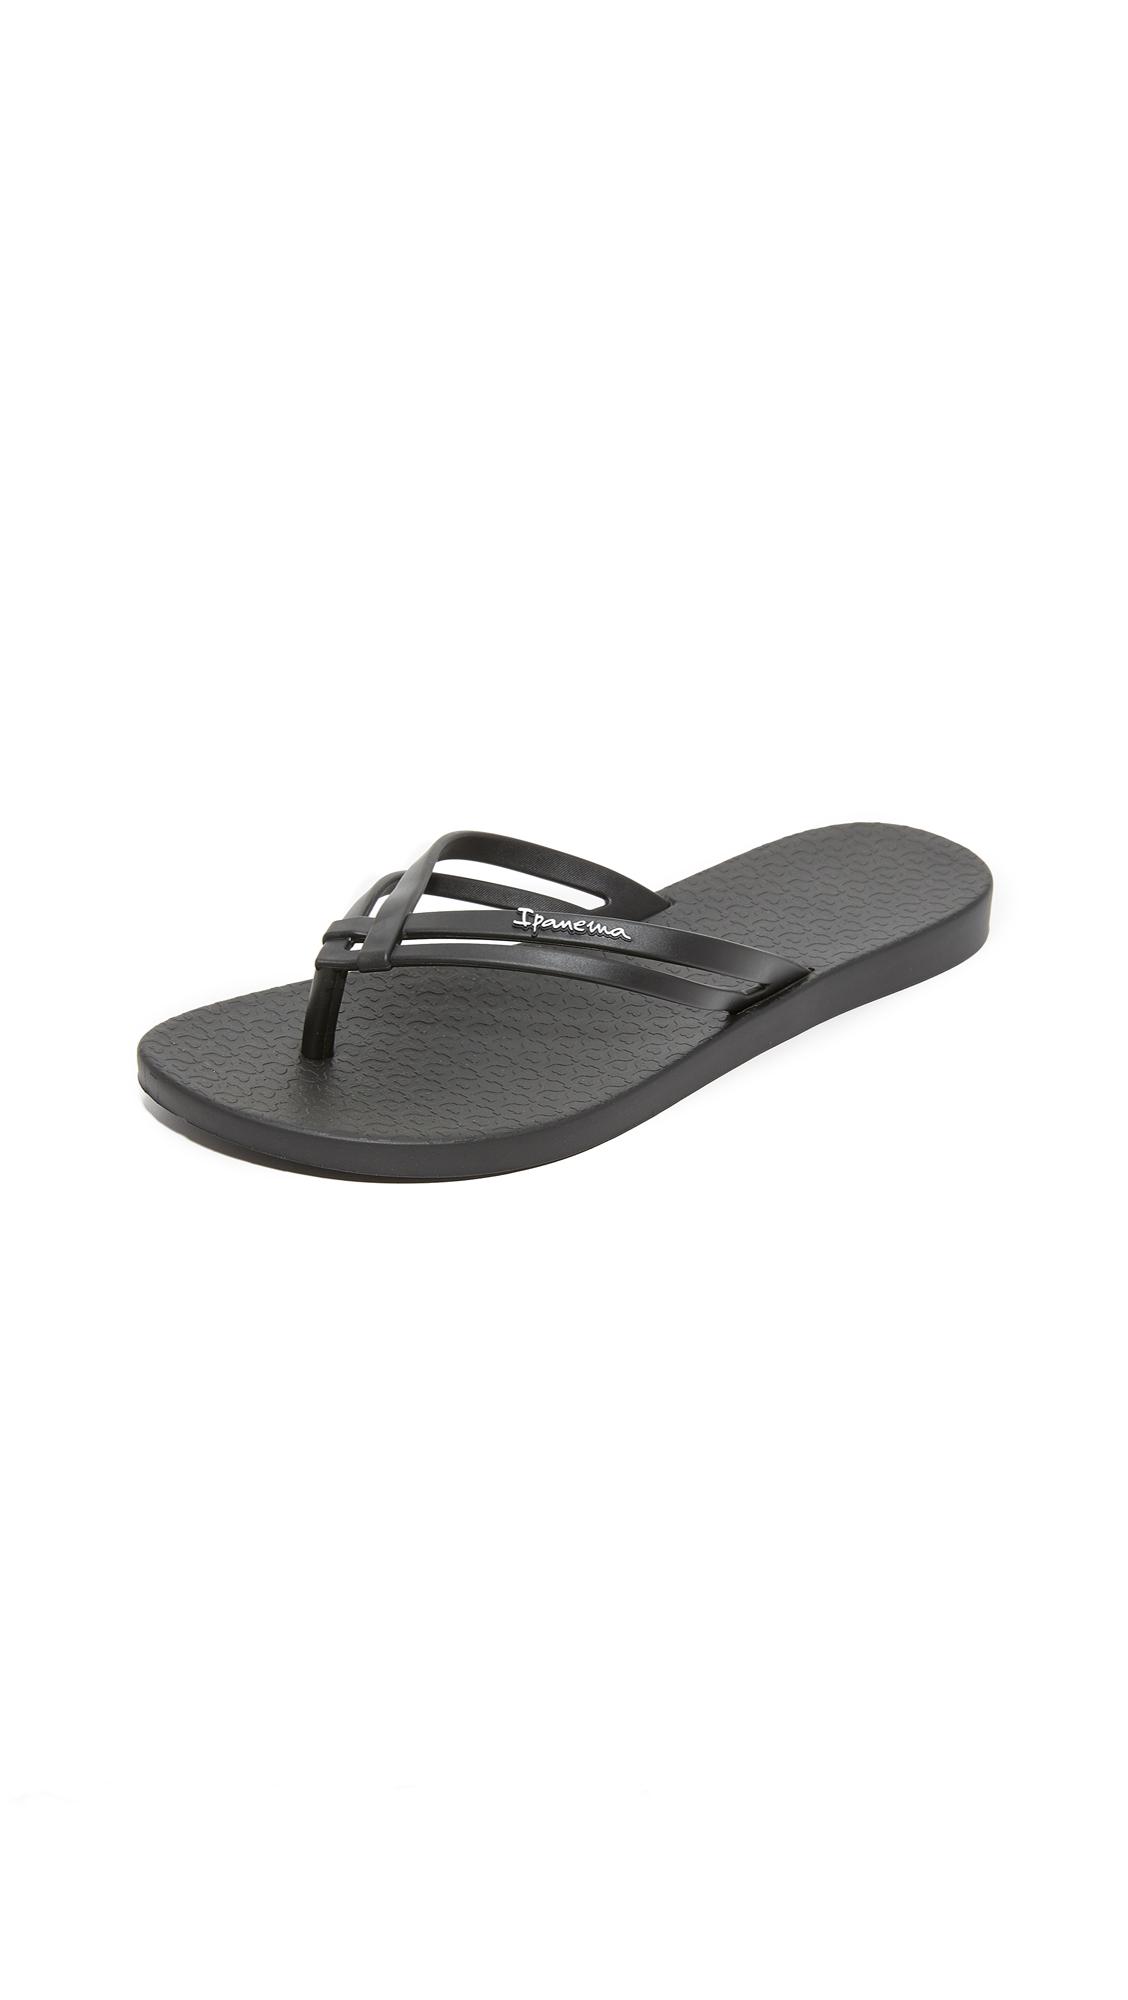 Ipanema Hashtag Flip Flops - Black